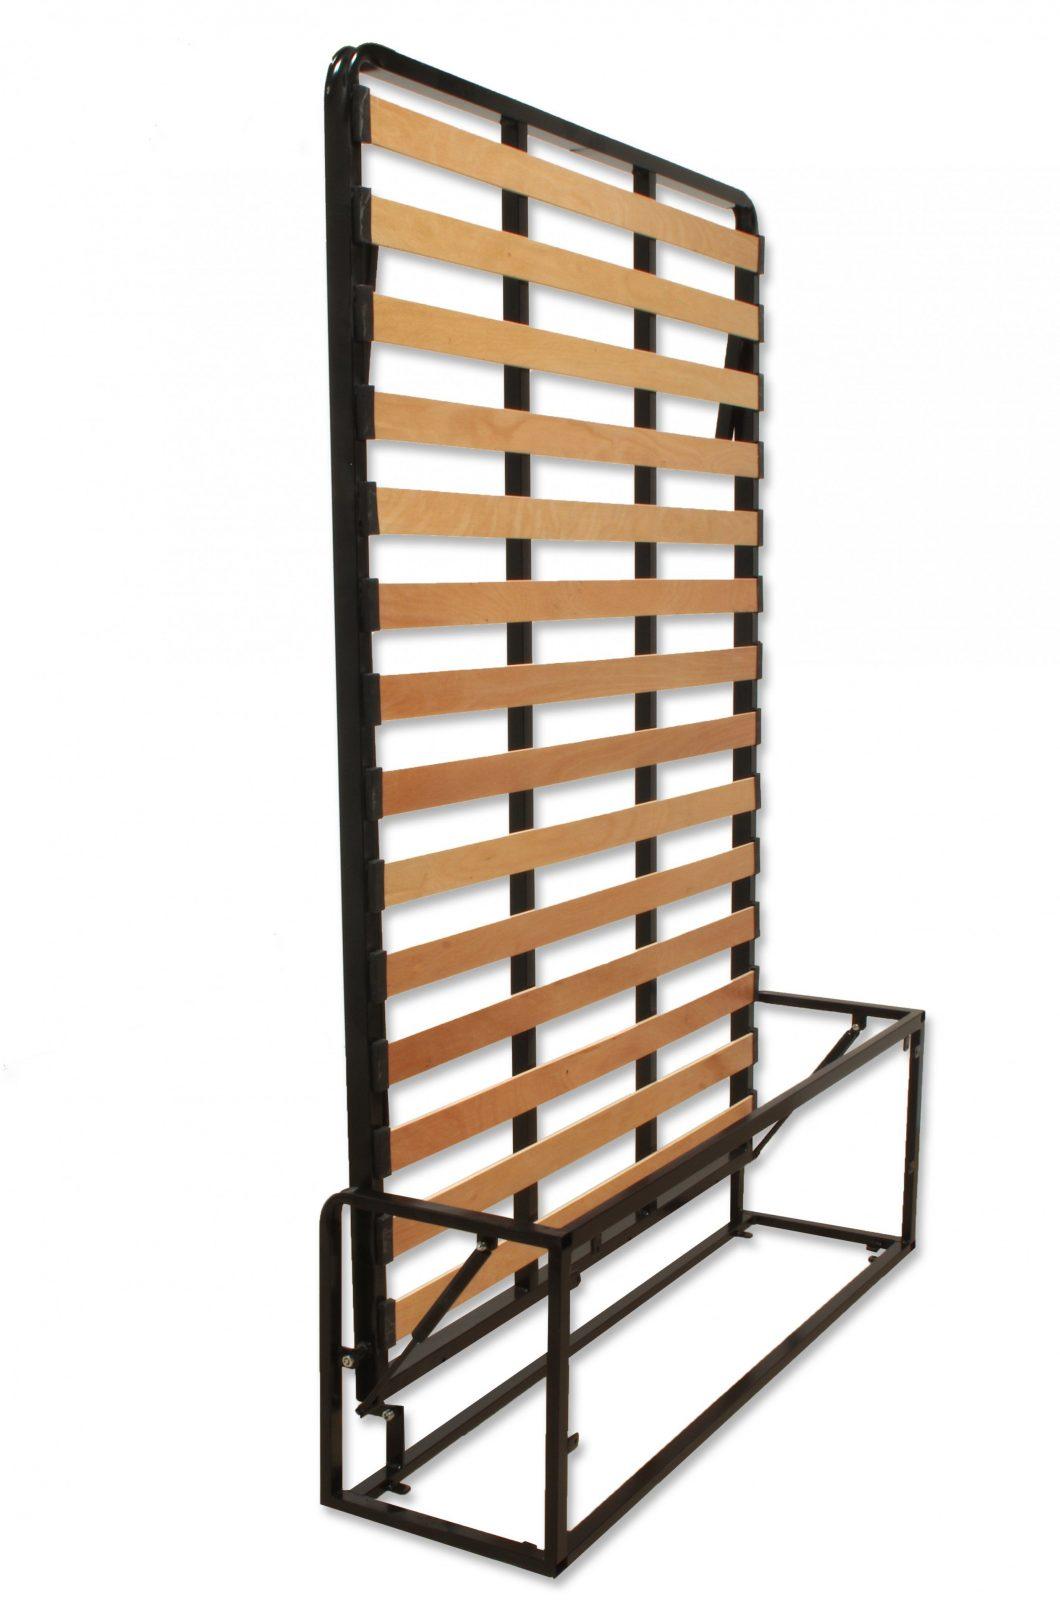 Schrankbett 140x200 Selber Bauen Haus Design Ideen